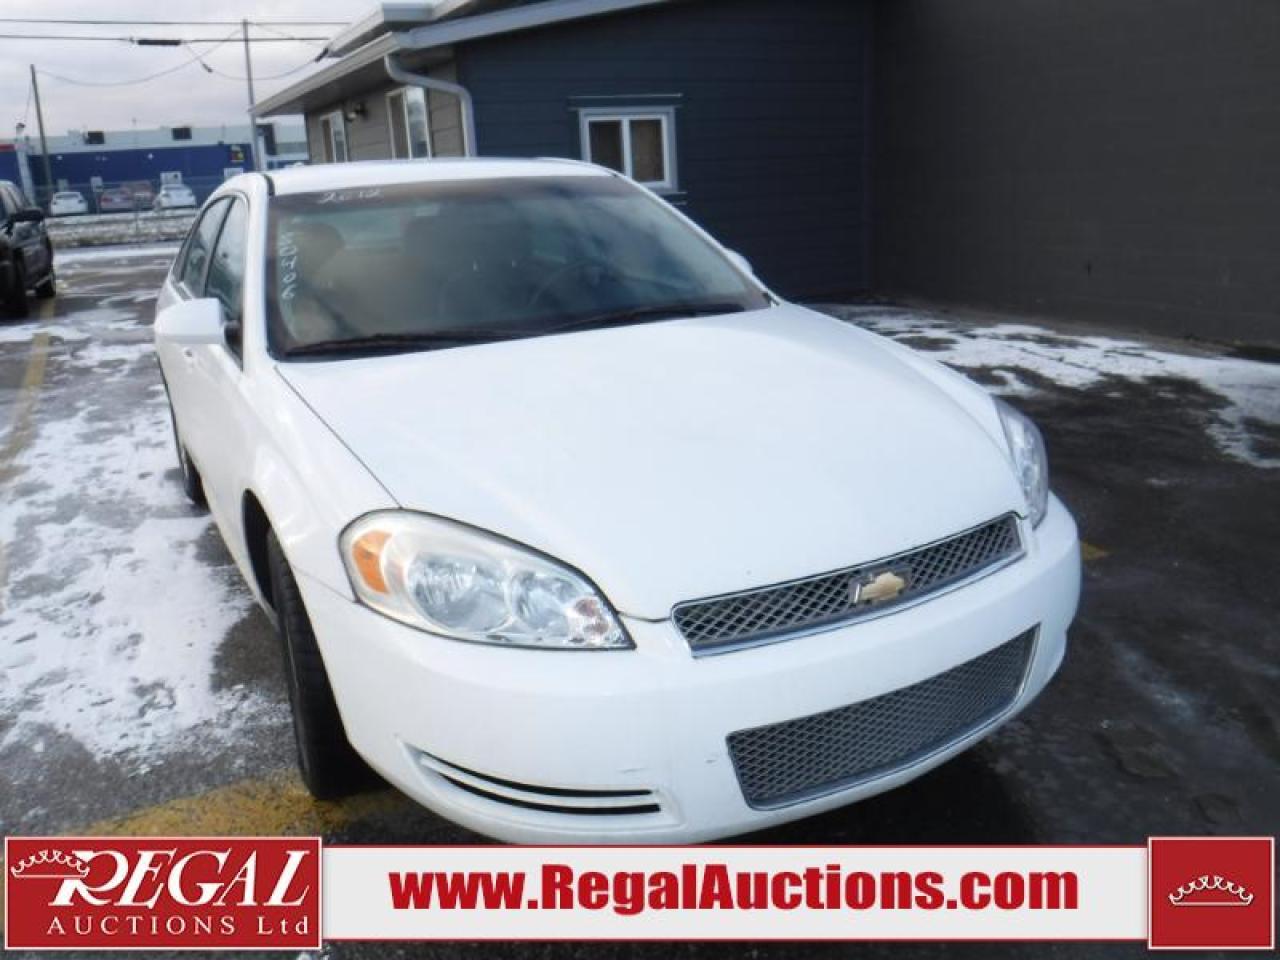 Photo of White 2012 Chevrolet Impala